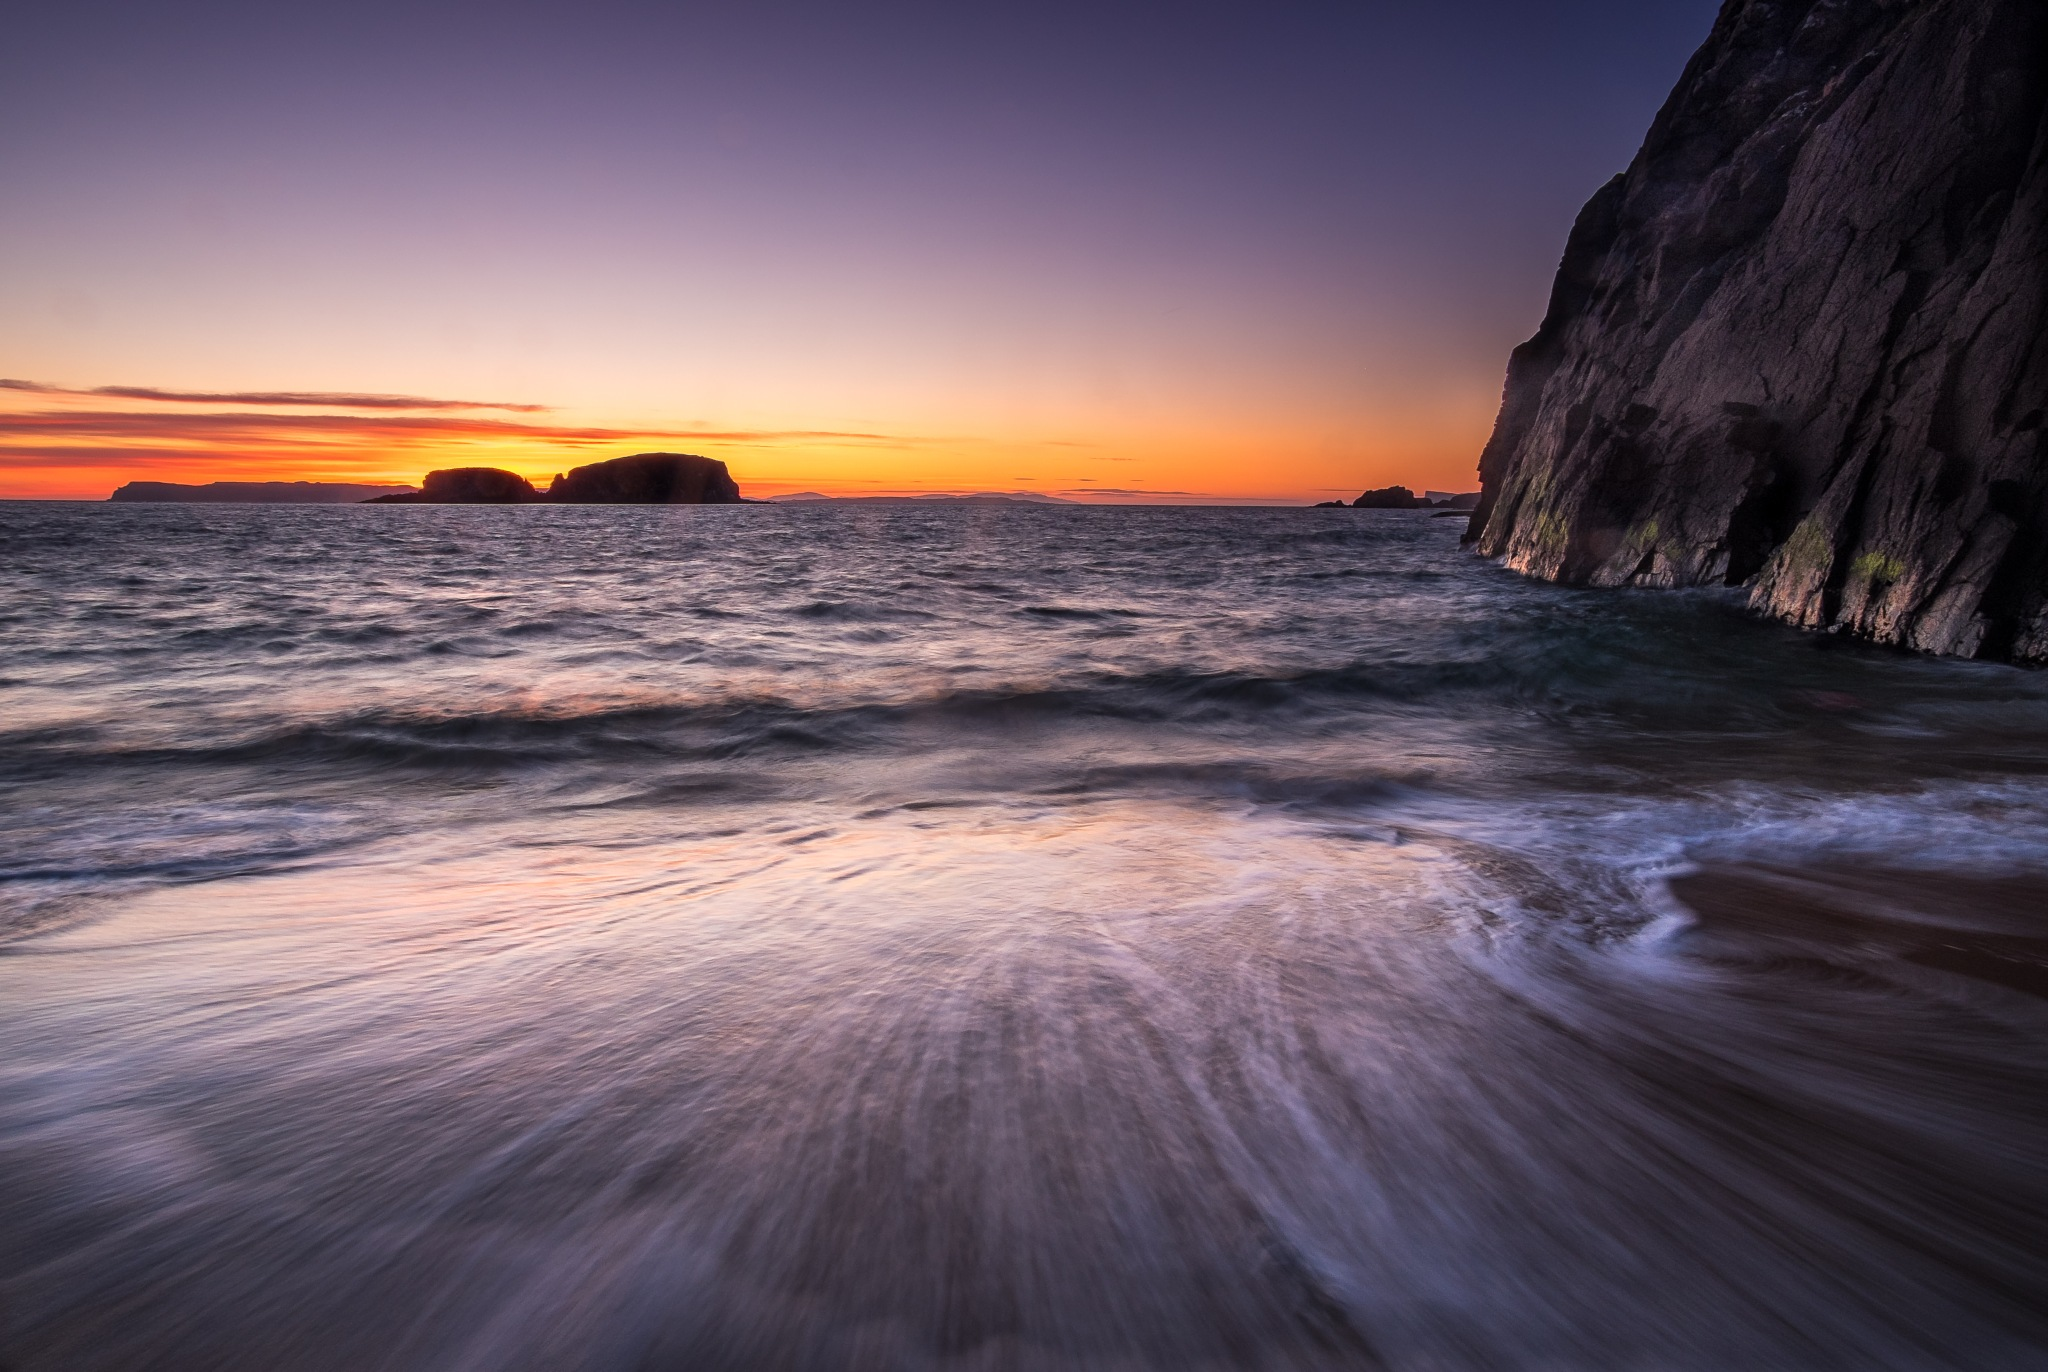 The secret beach by Lee Morrow